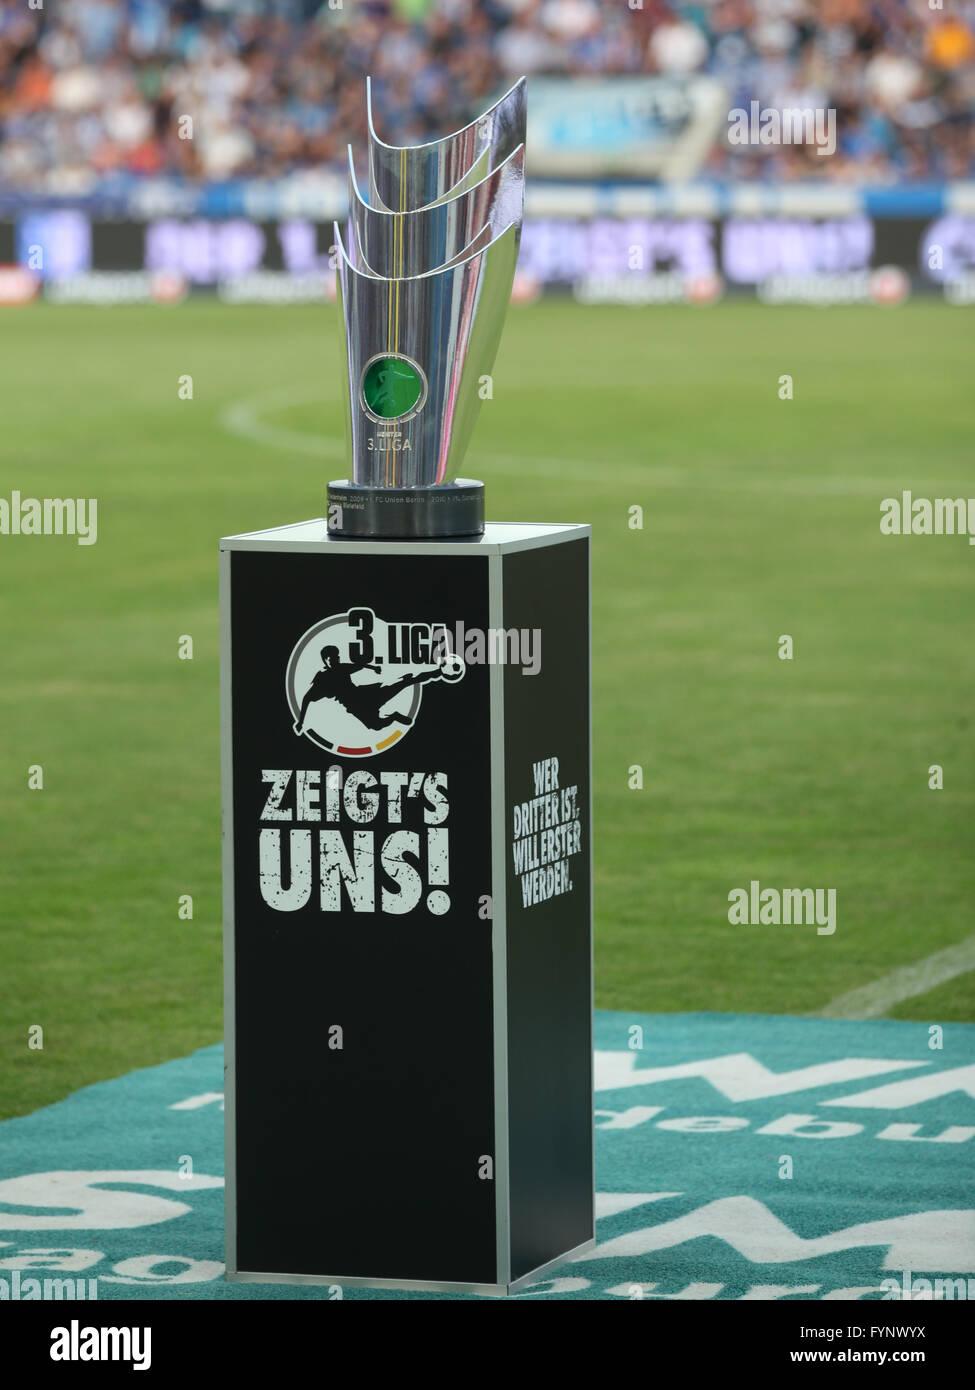 3.Liga DFB Cup Champion - Stock Image